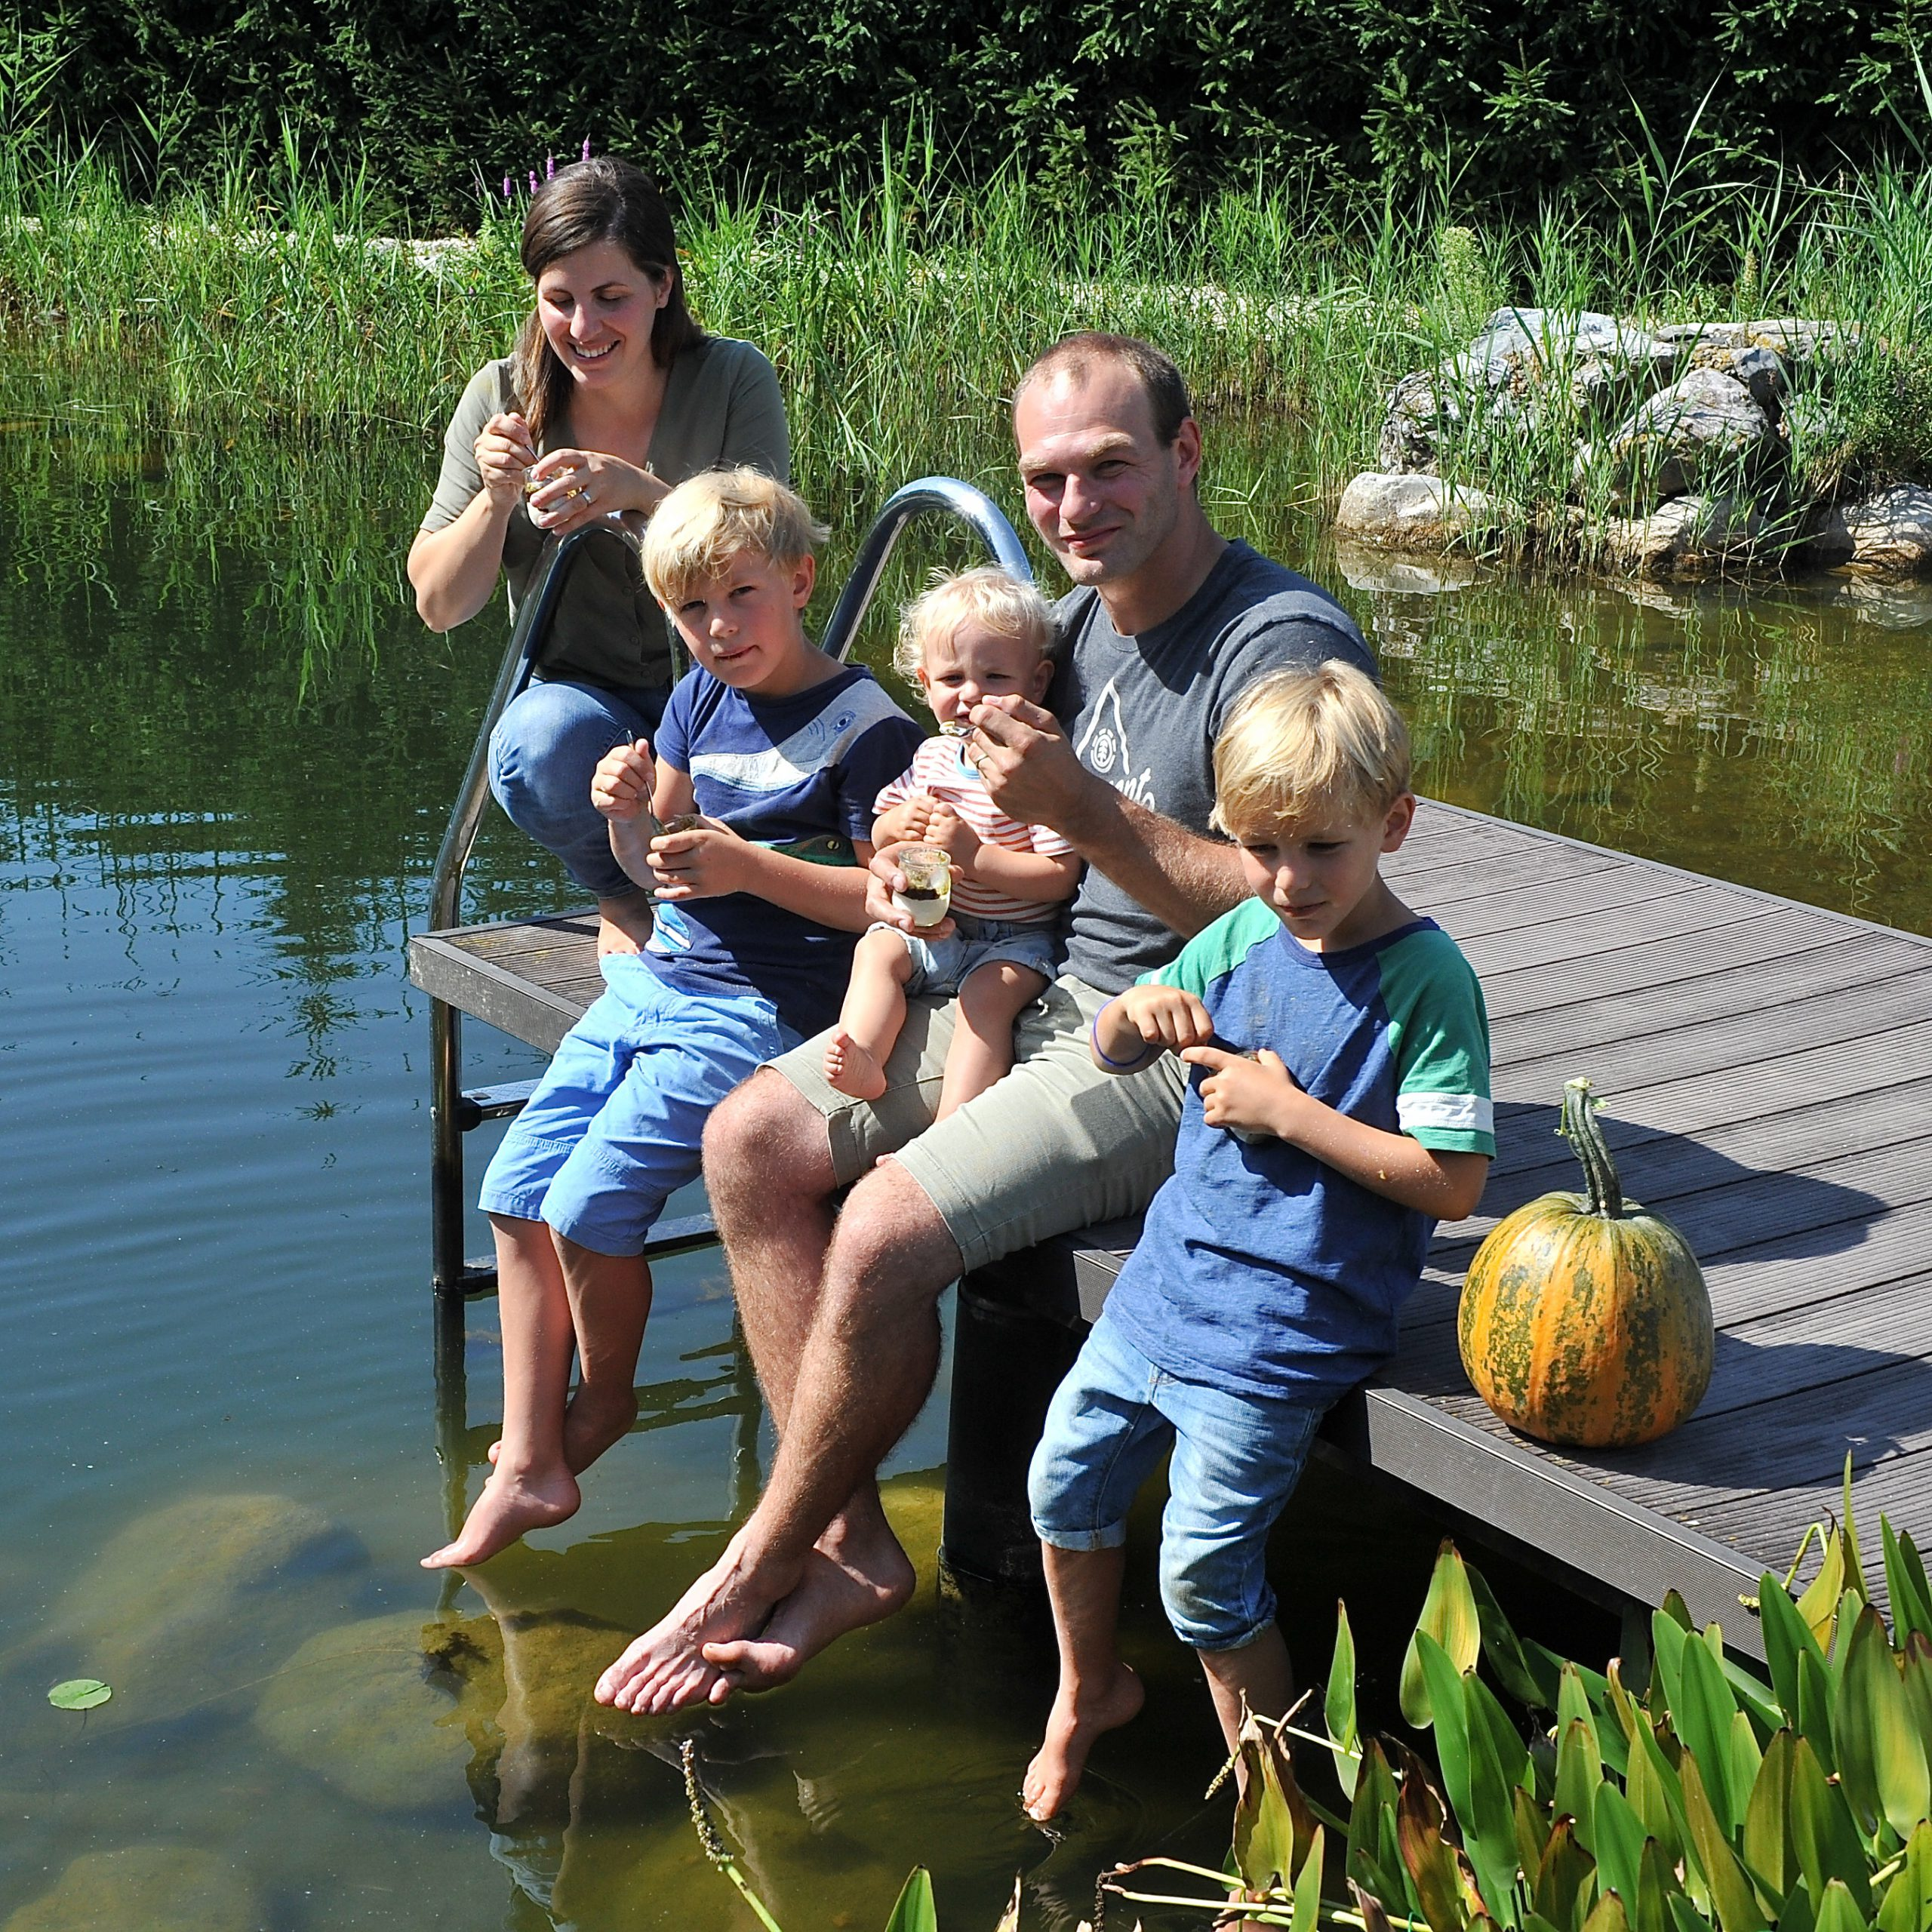 Familie am Teich